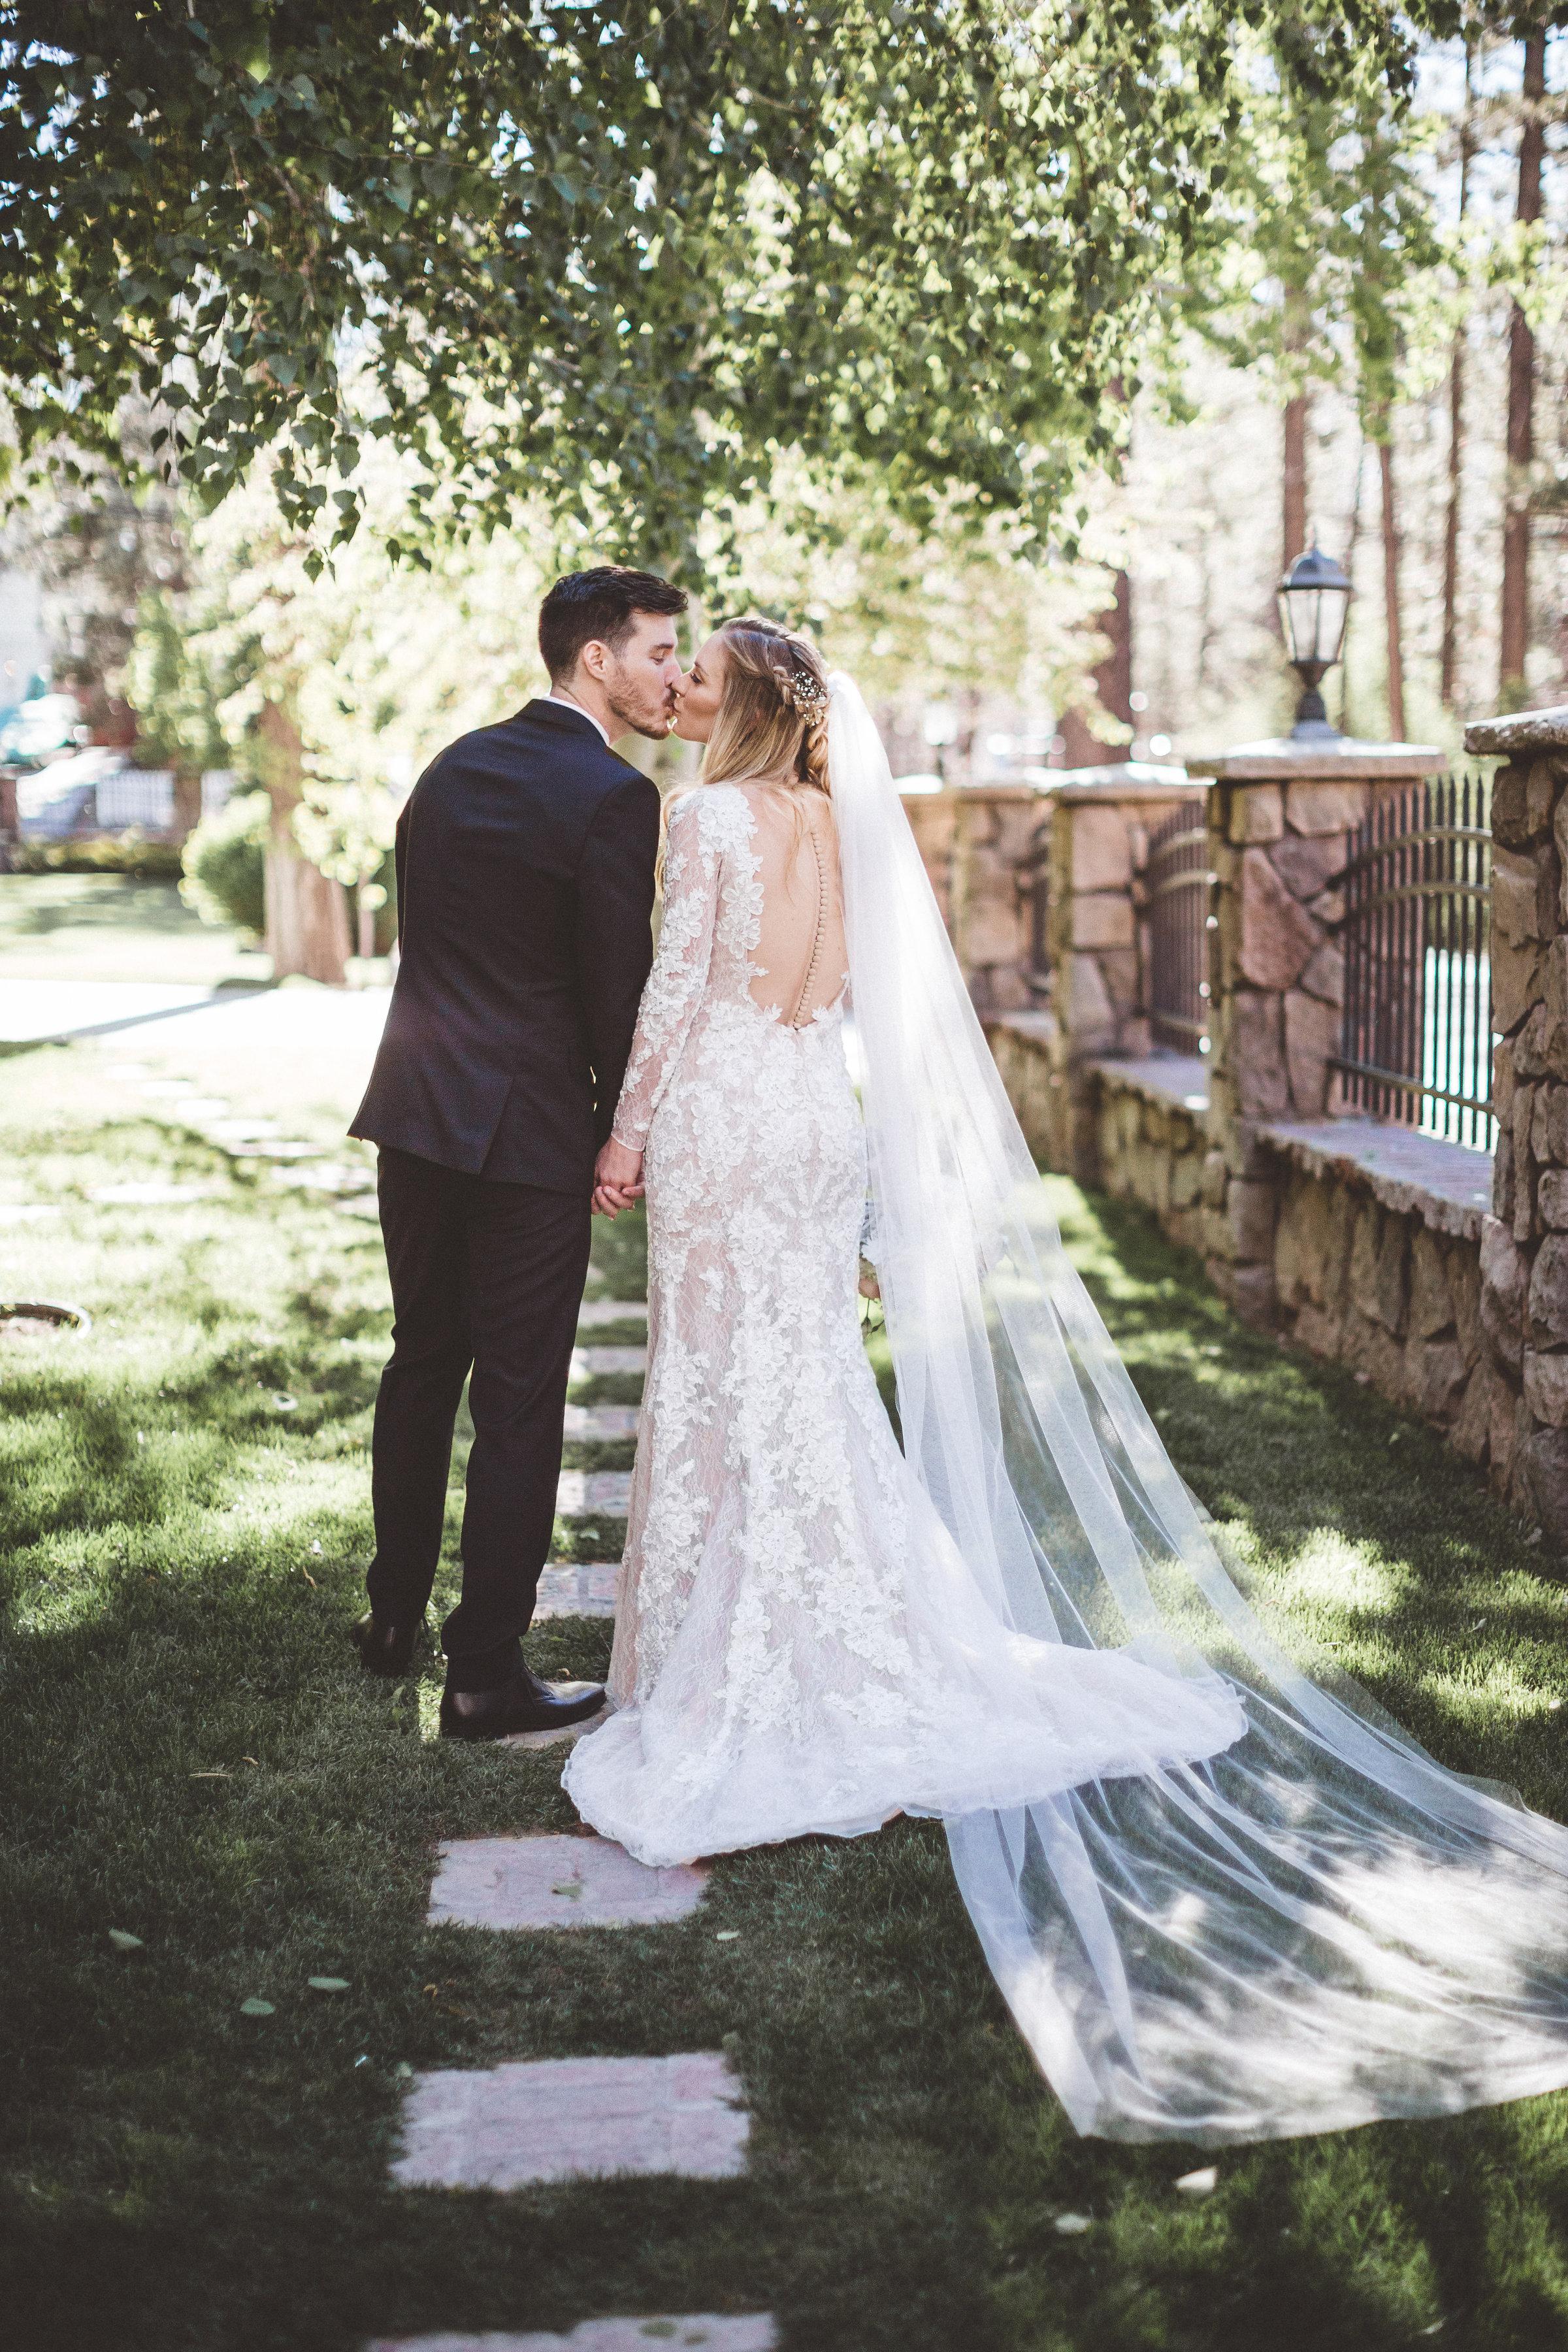 jill-and-alexs-intimates-big-bear-wedding30.jpg